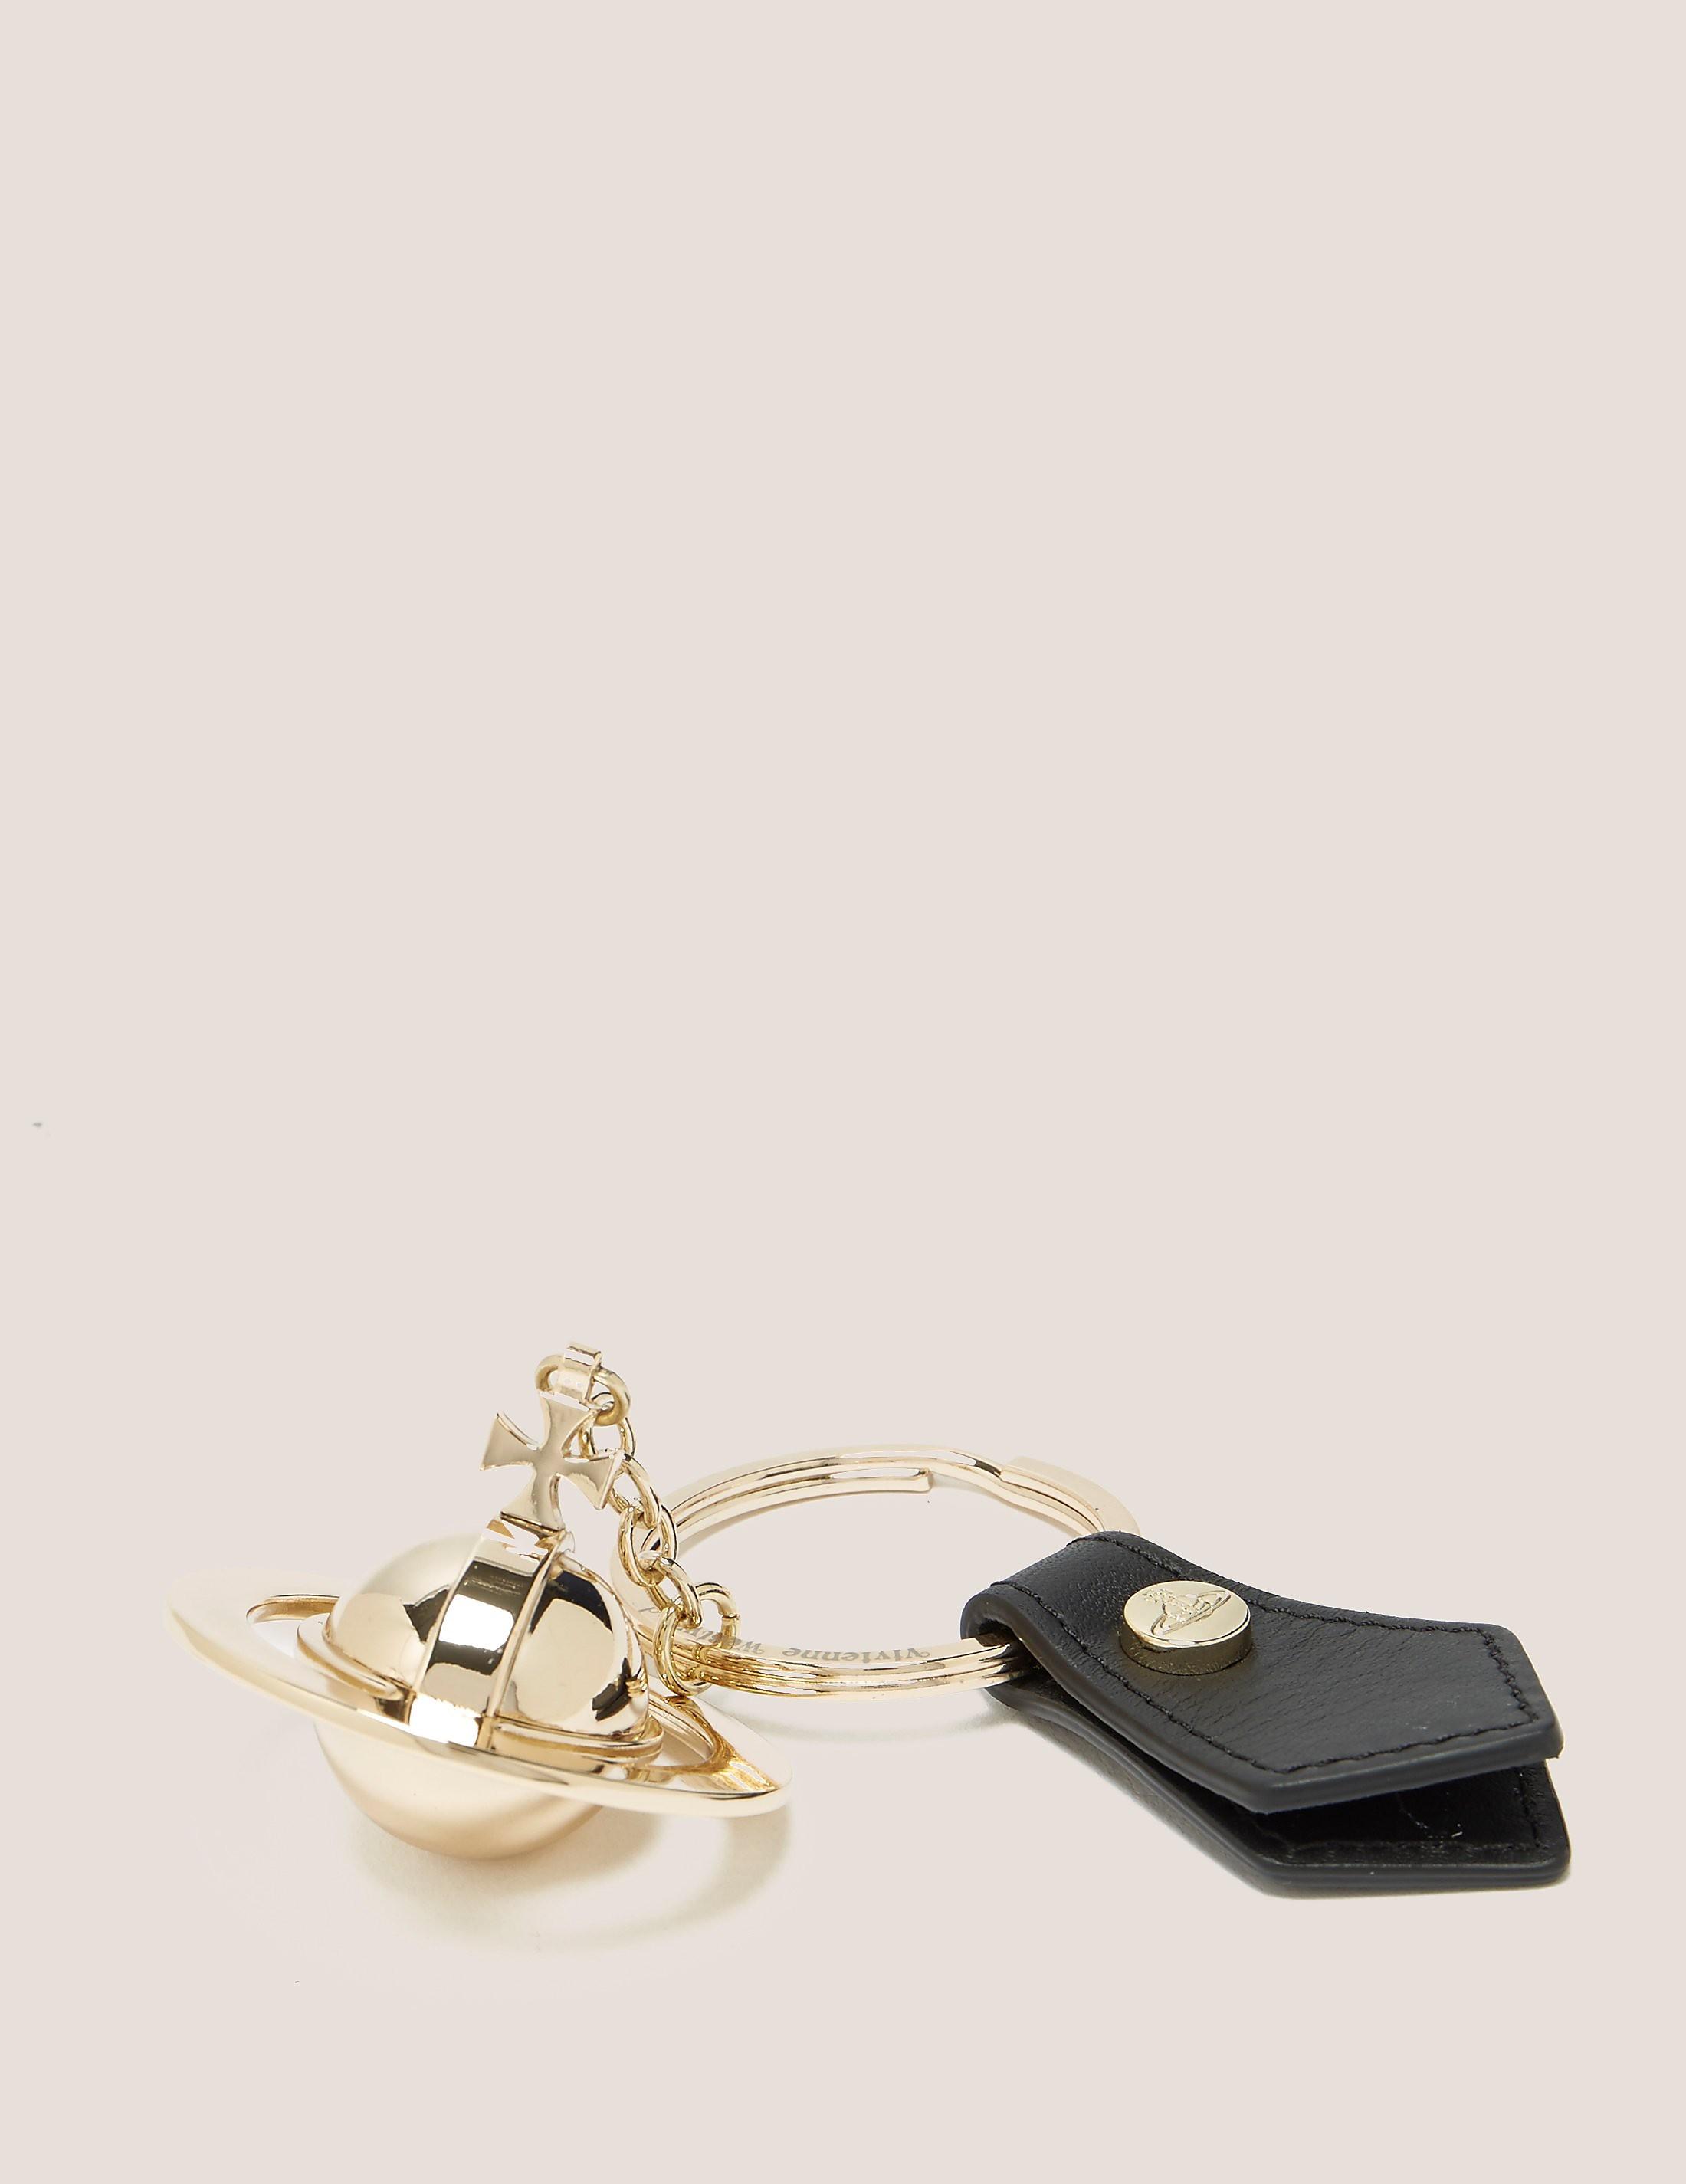 Vivienne Westwood 3D Orb Keychain